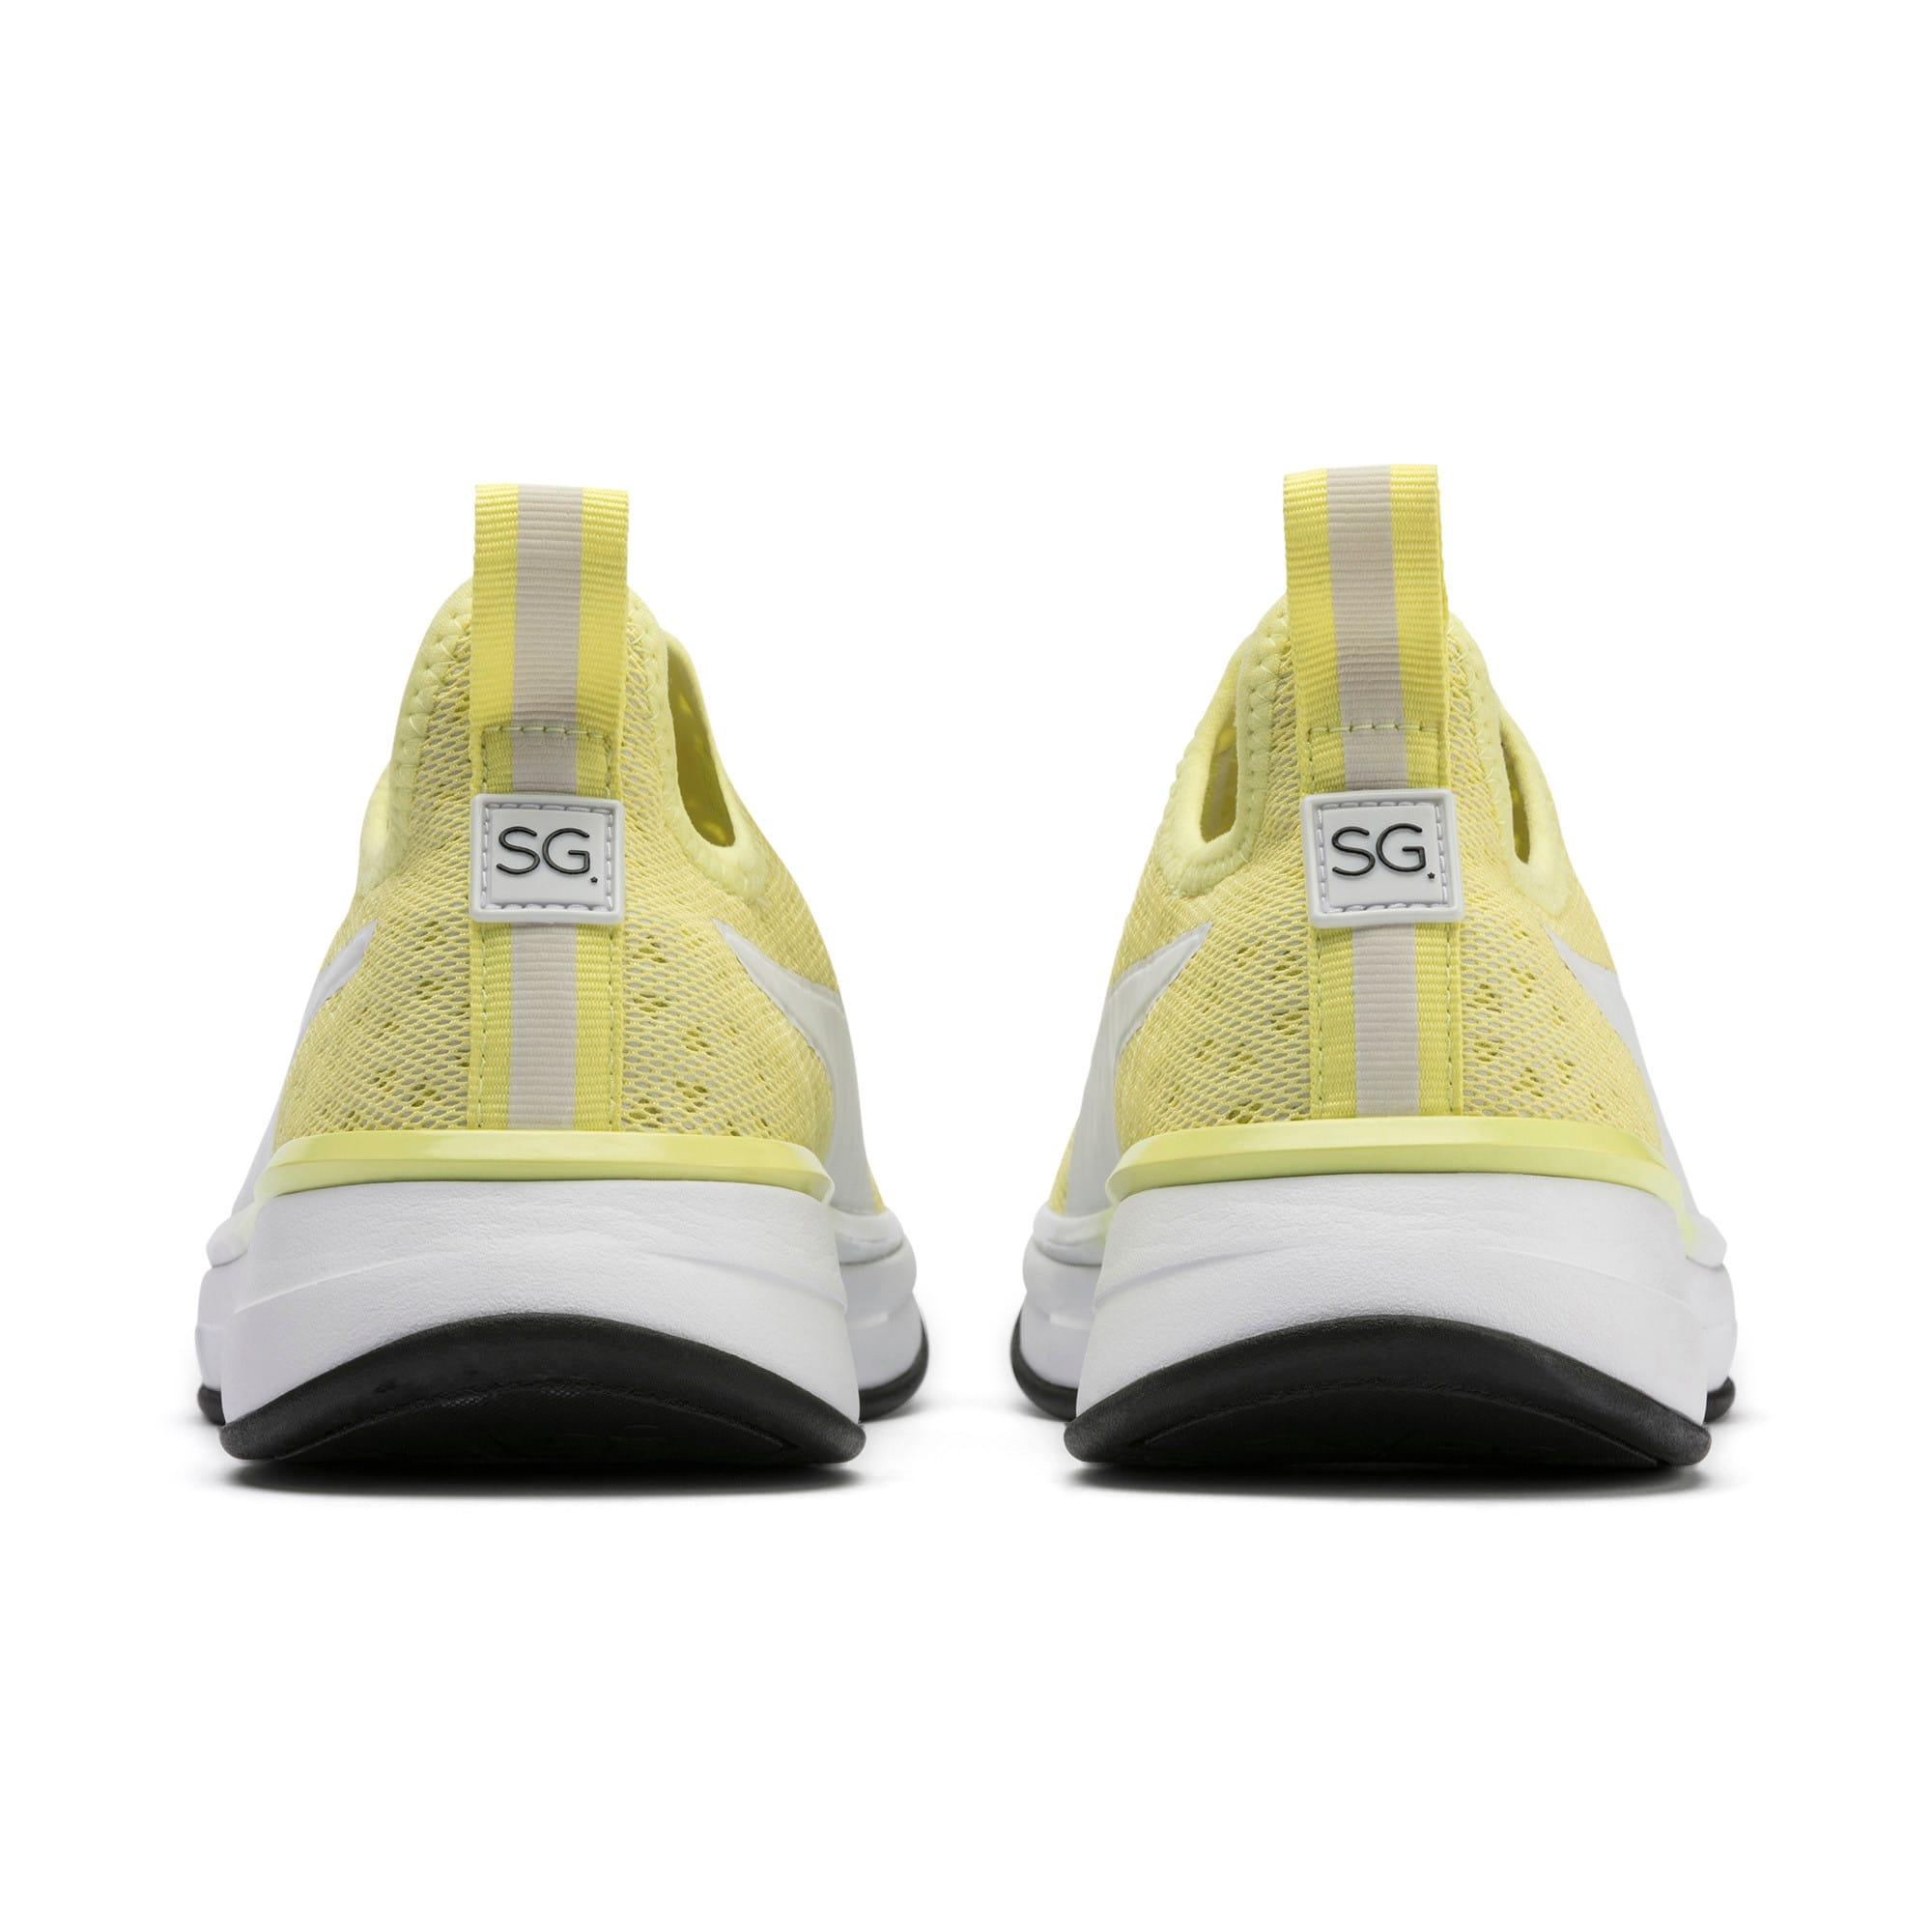 Thumbnail 4 of PUMA x SELENA GOMEZ Slip-On Women's Training Shoes, YELLOW-Puma White-Puma Black, medium